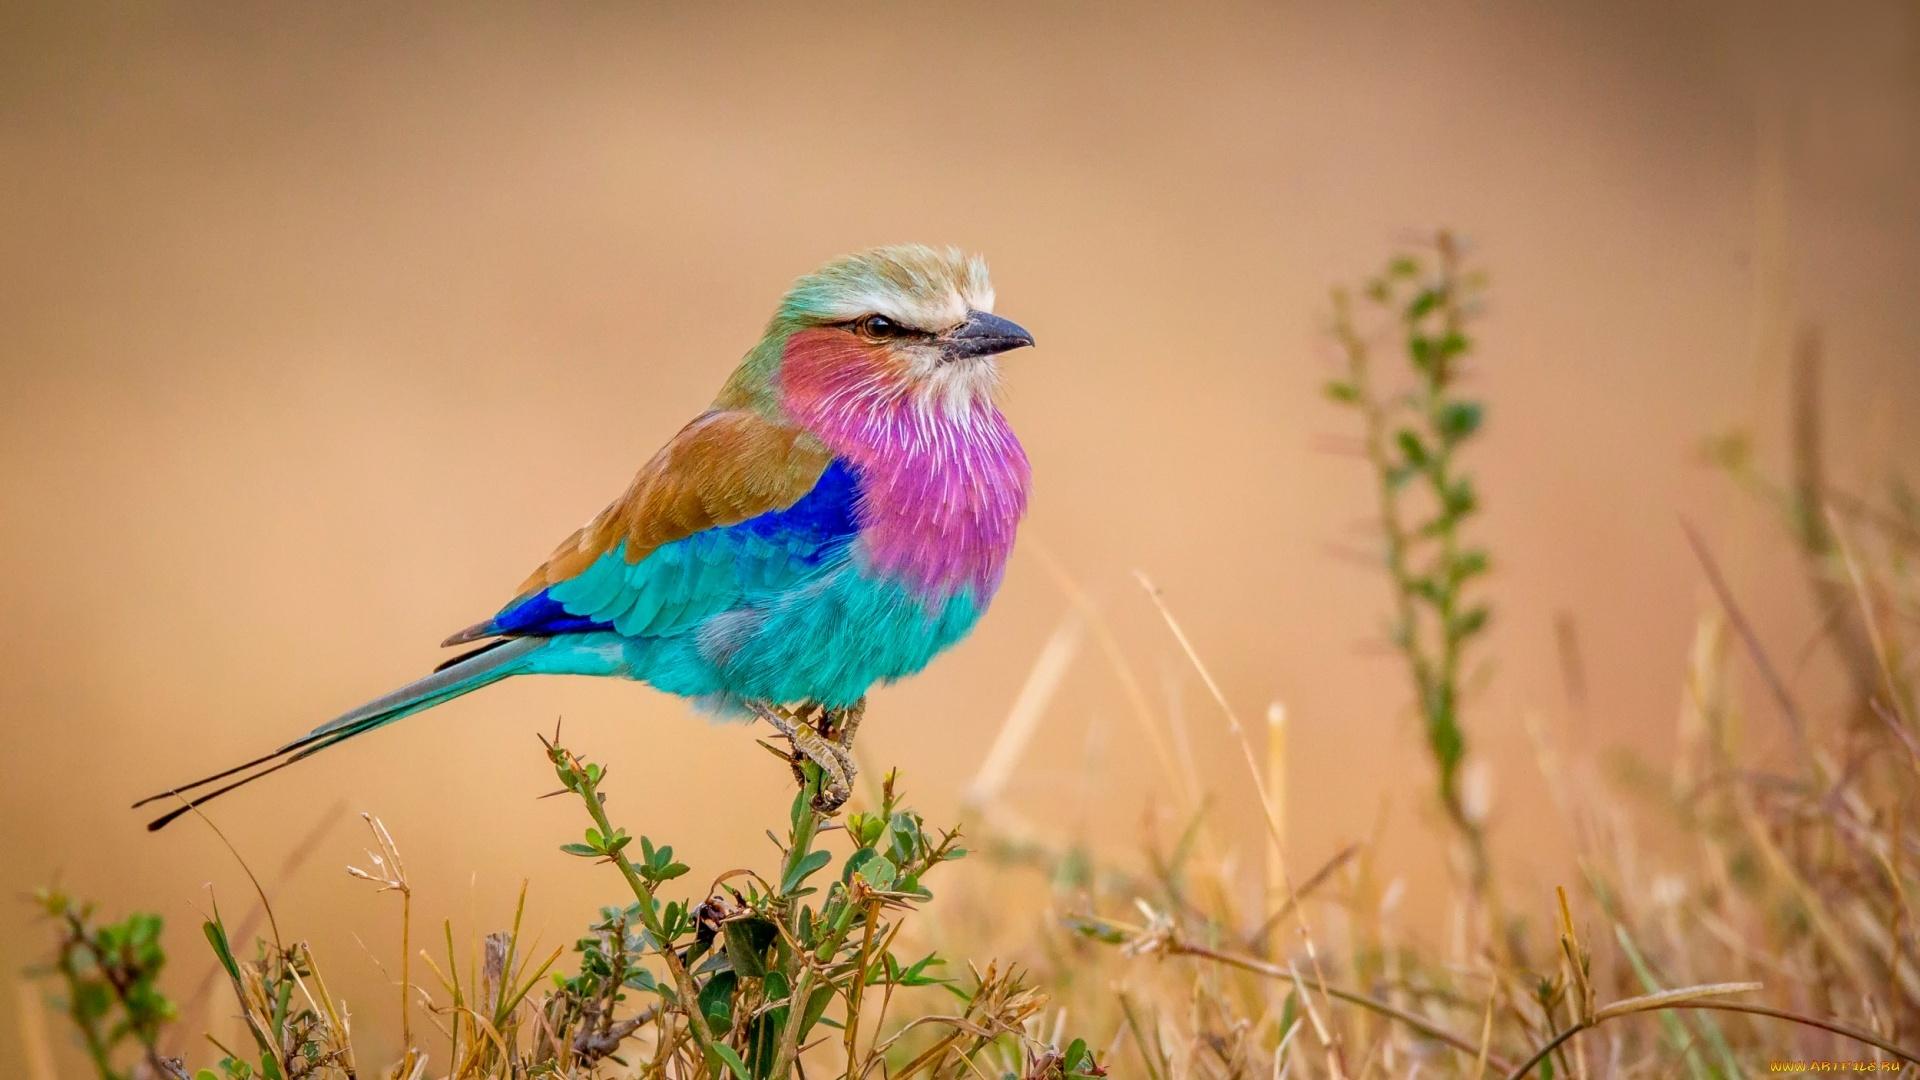 Colorful Bird 1080p wallpaper